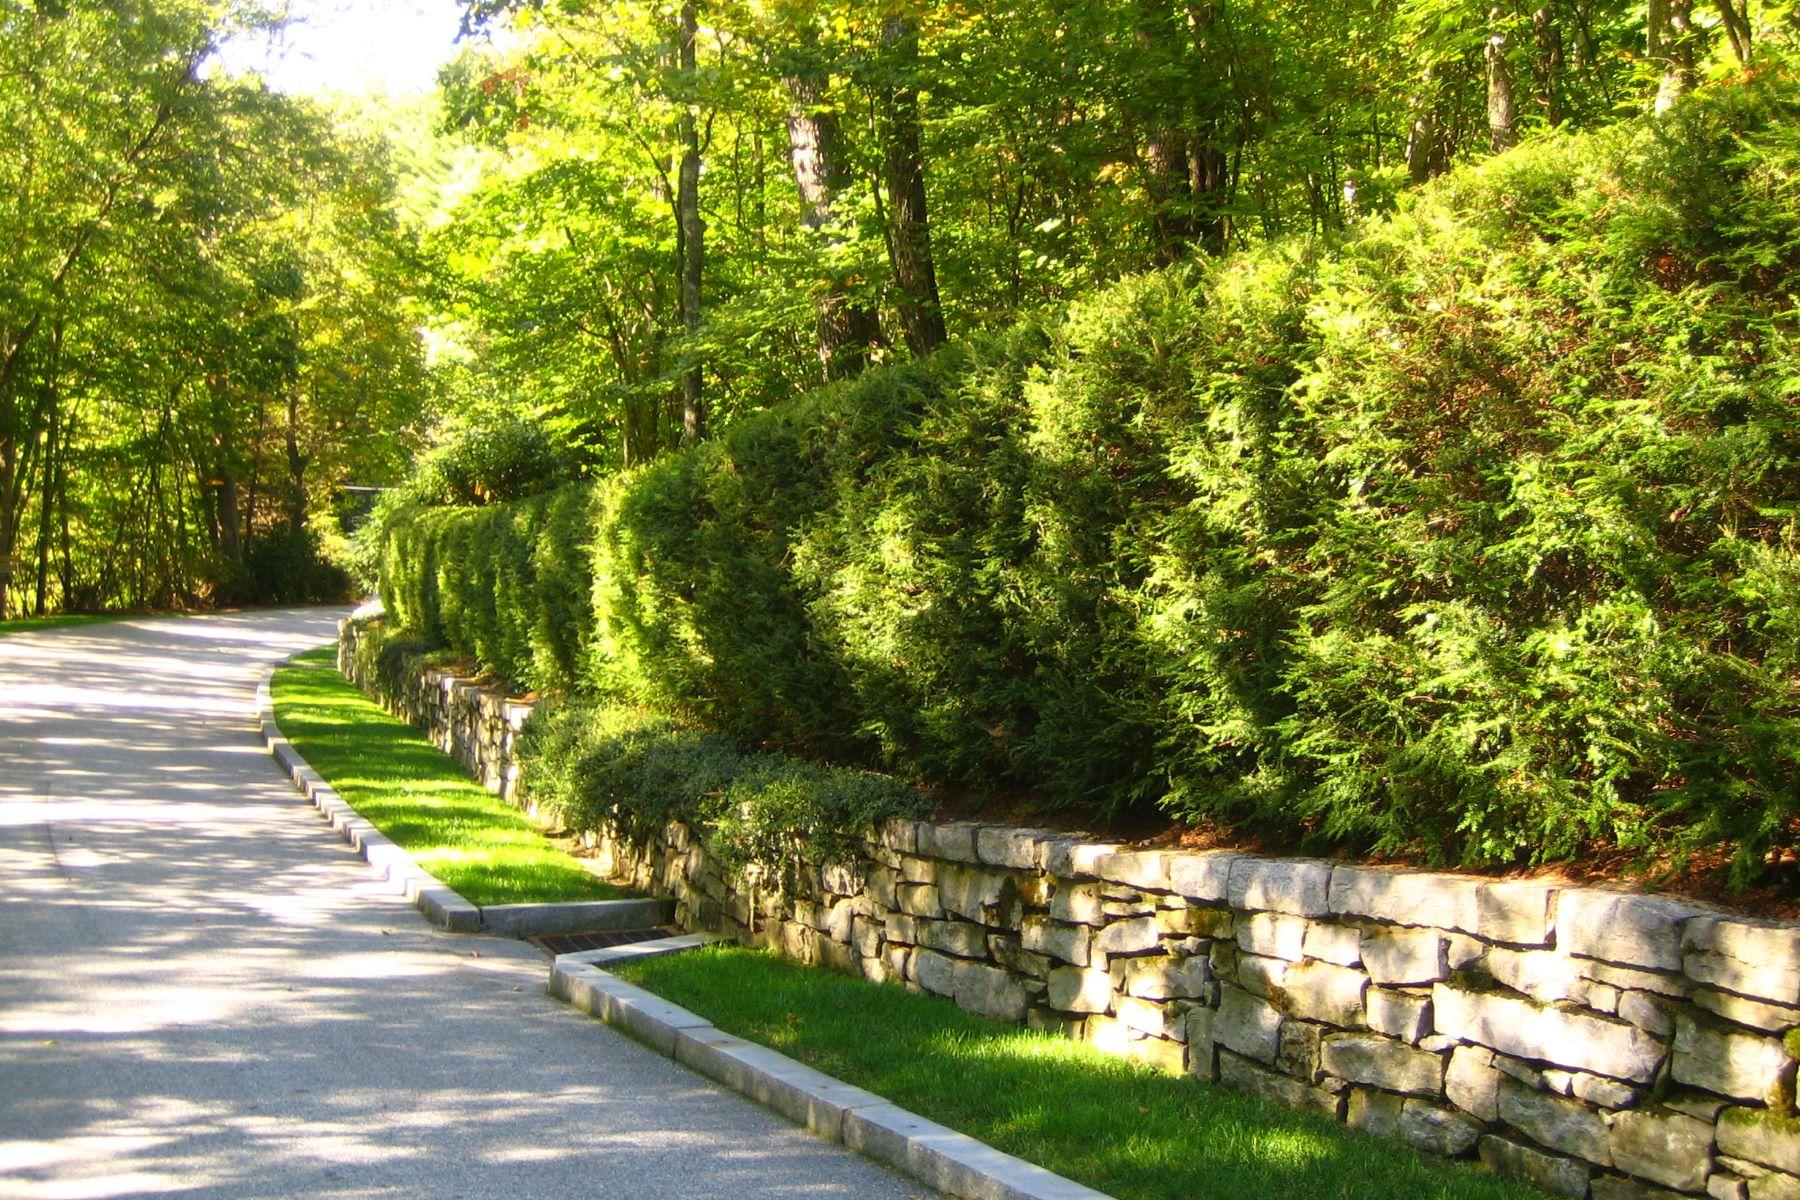 Land for Sale at 100 Ravenel Ridge Road 100 Ravenel Ridge Rd, Highlands, North Carolina, 28741 United States